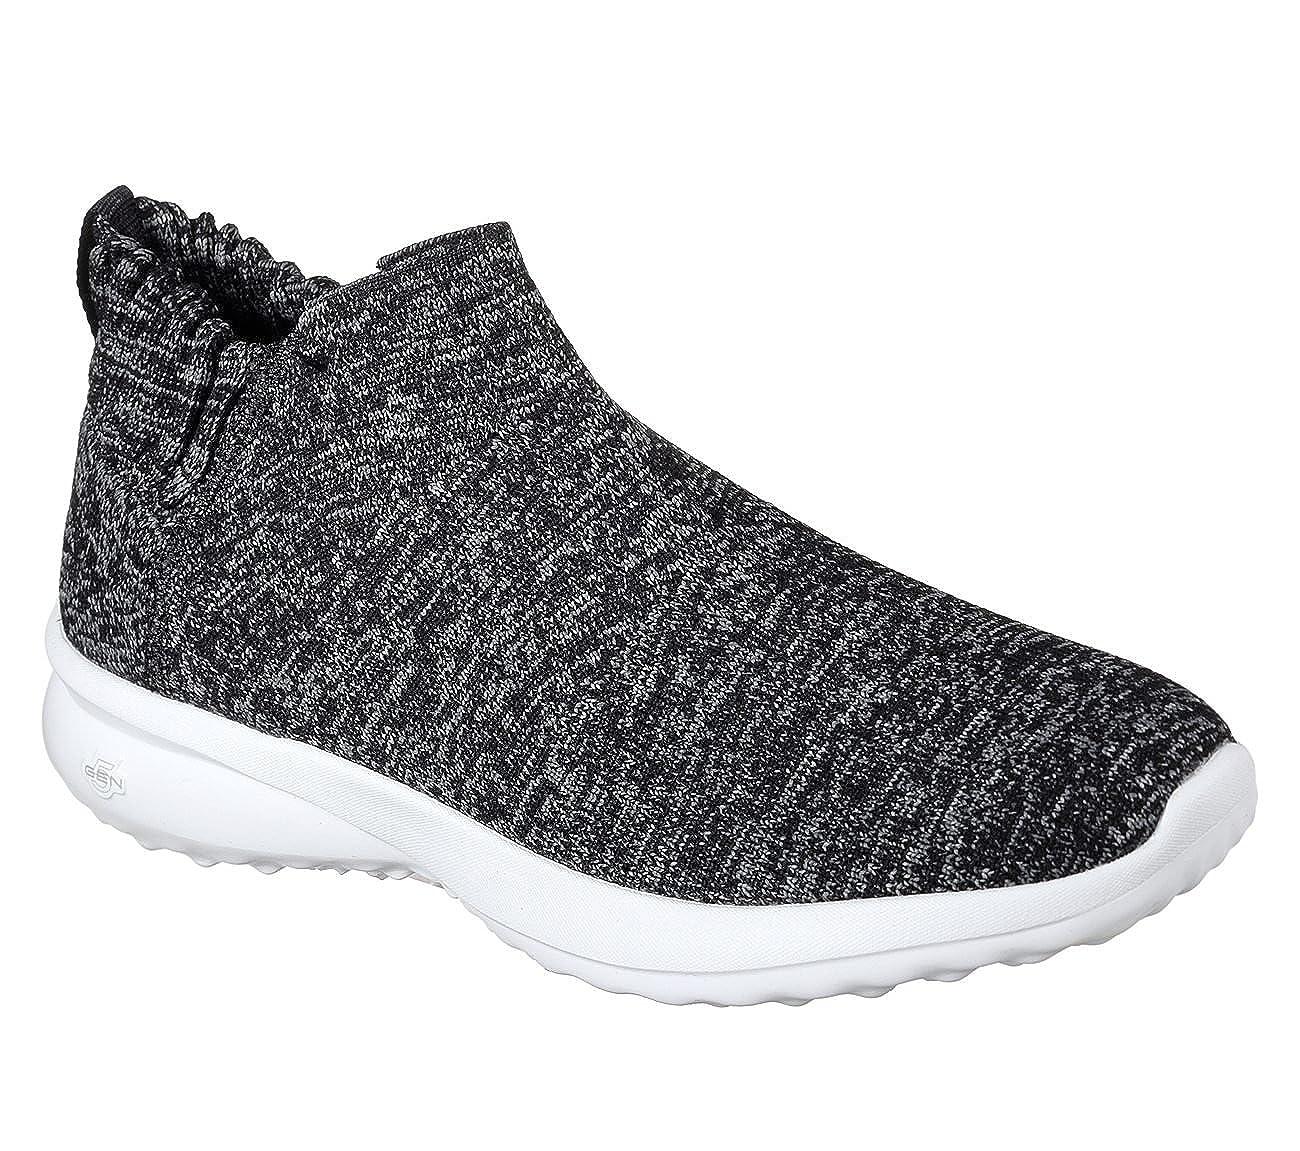 967cfe866870 Skechers On The Go City 3.0 Sensible Womens Slip On Sneaker Bootie:  Amazon.ca: Shoes & Handbags